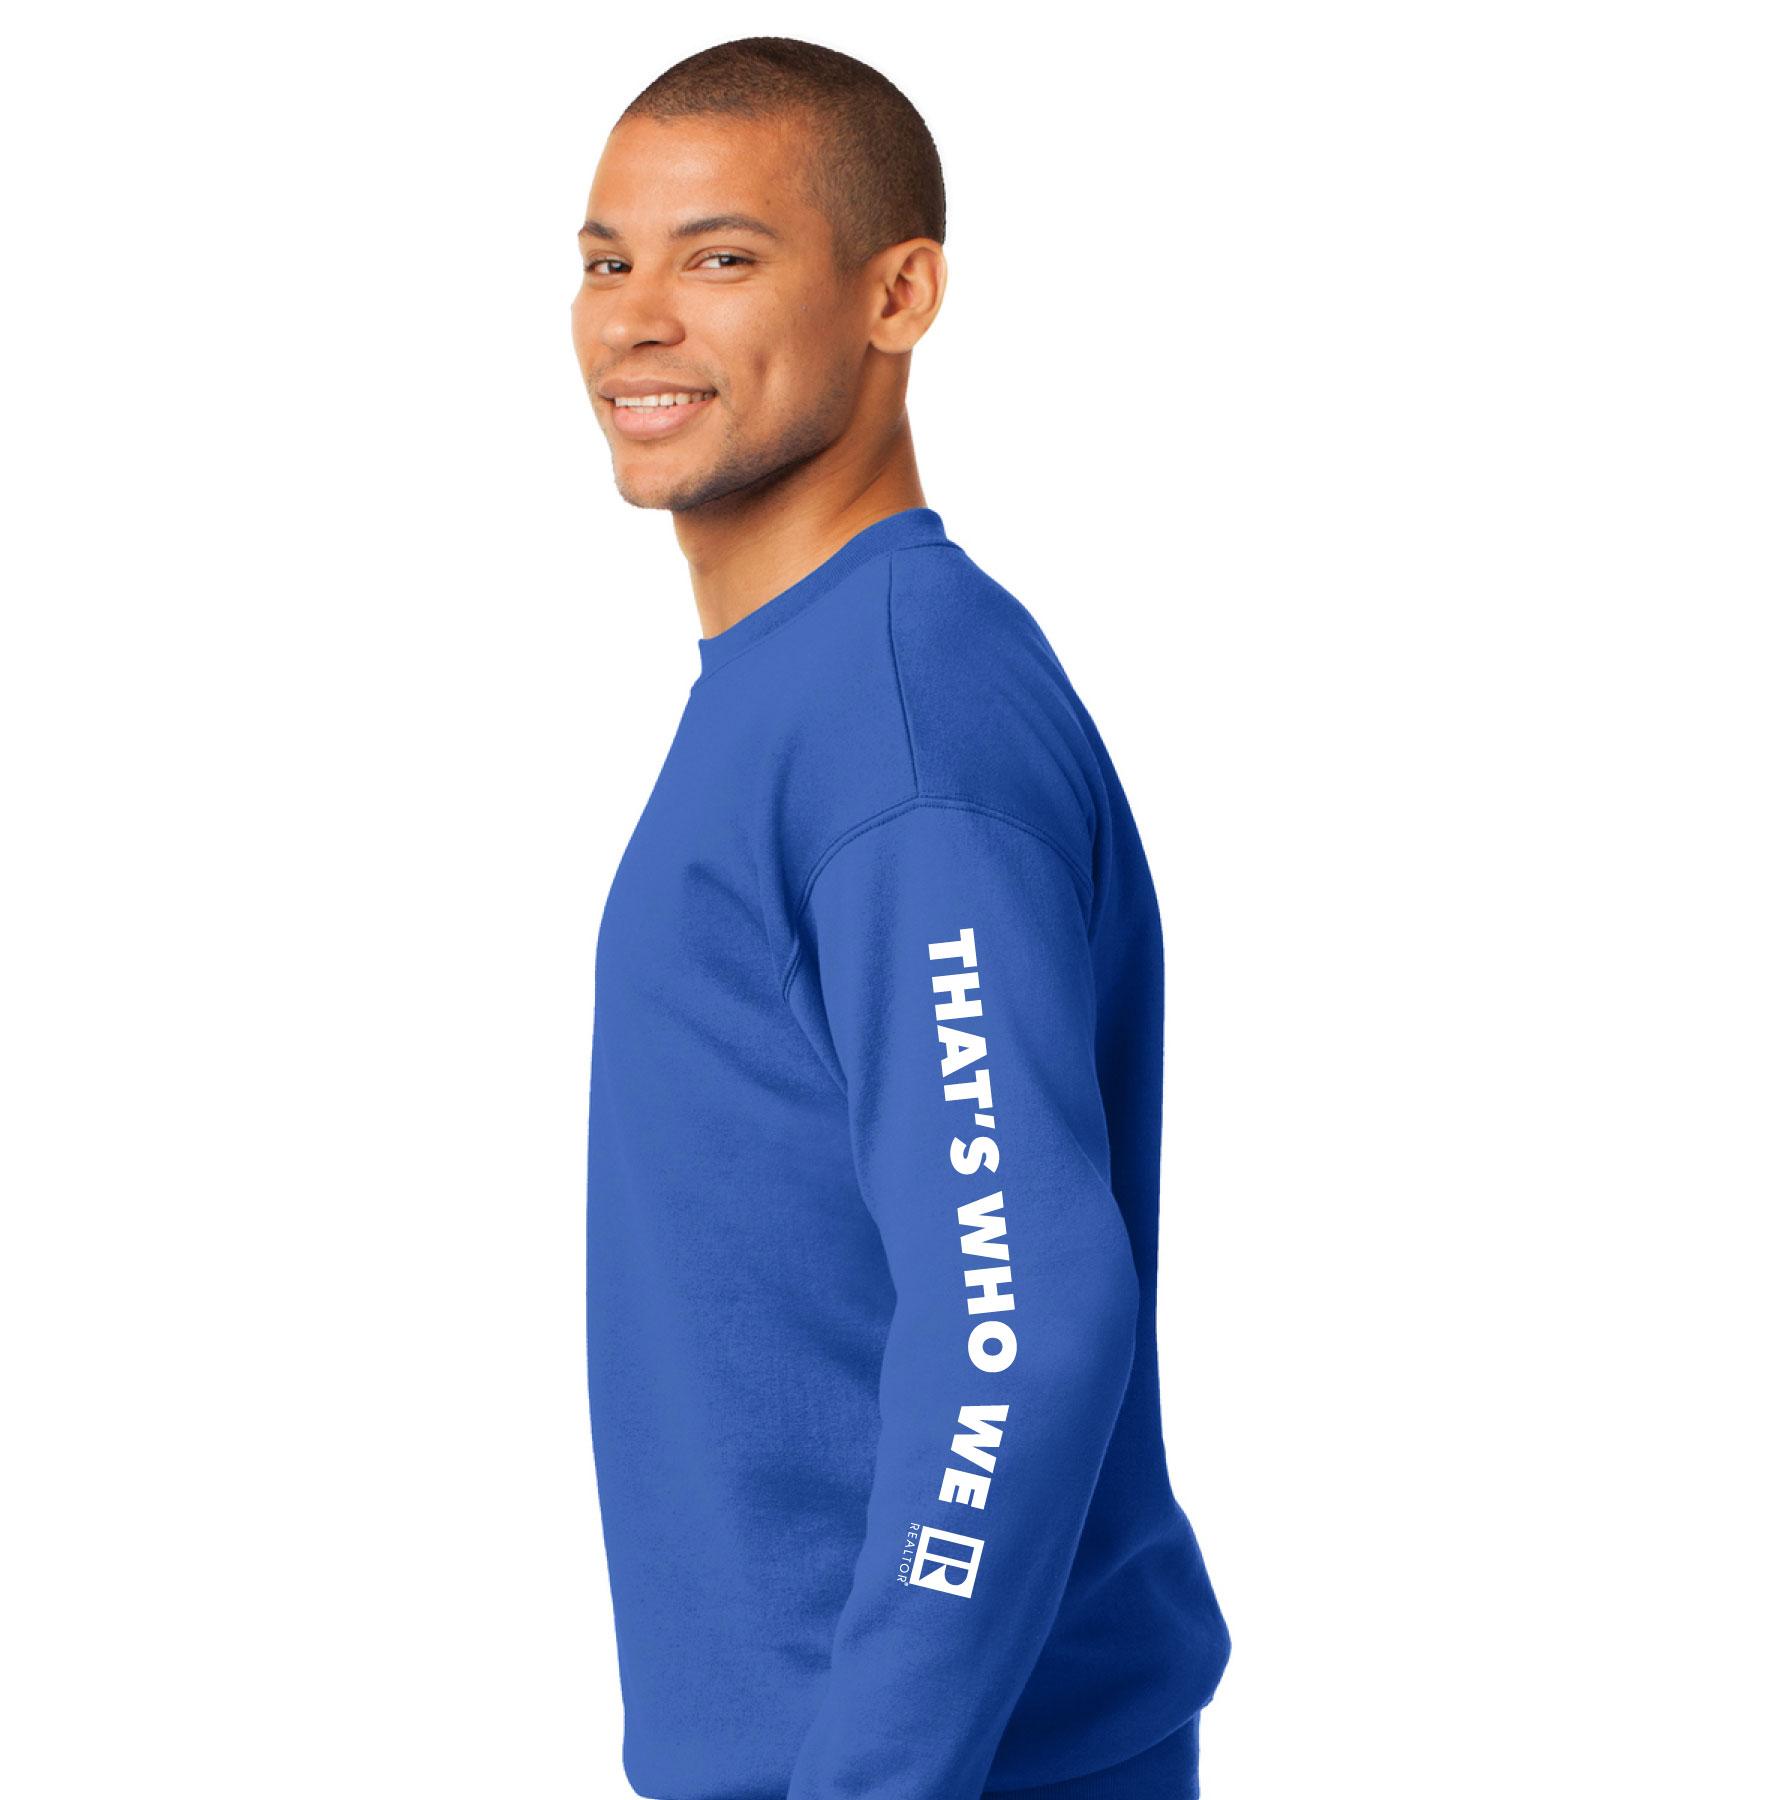 Fair Housing Crewneck Sweatshirt - FH1003